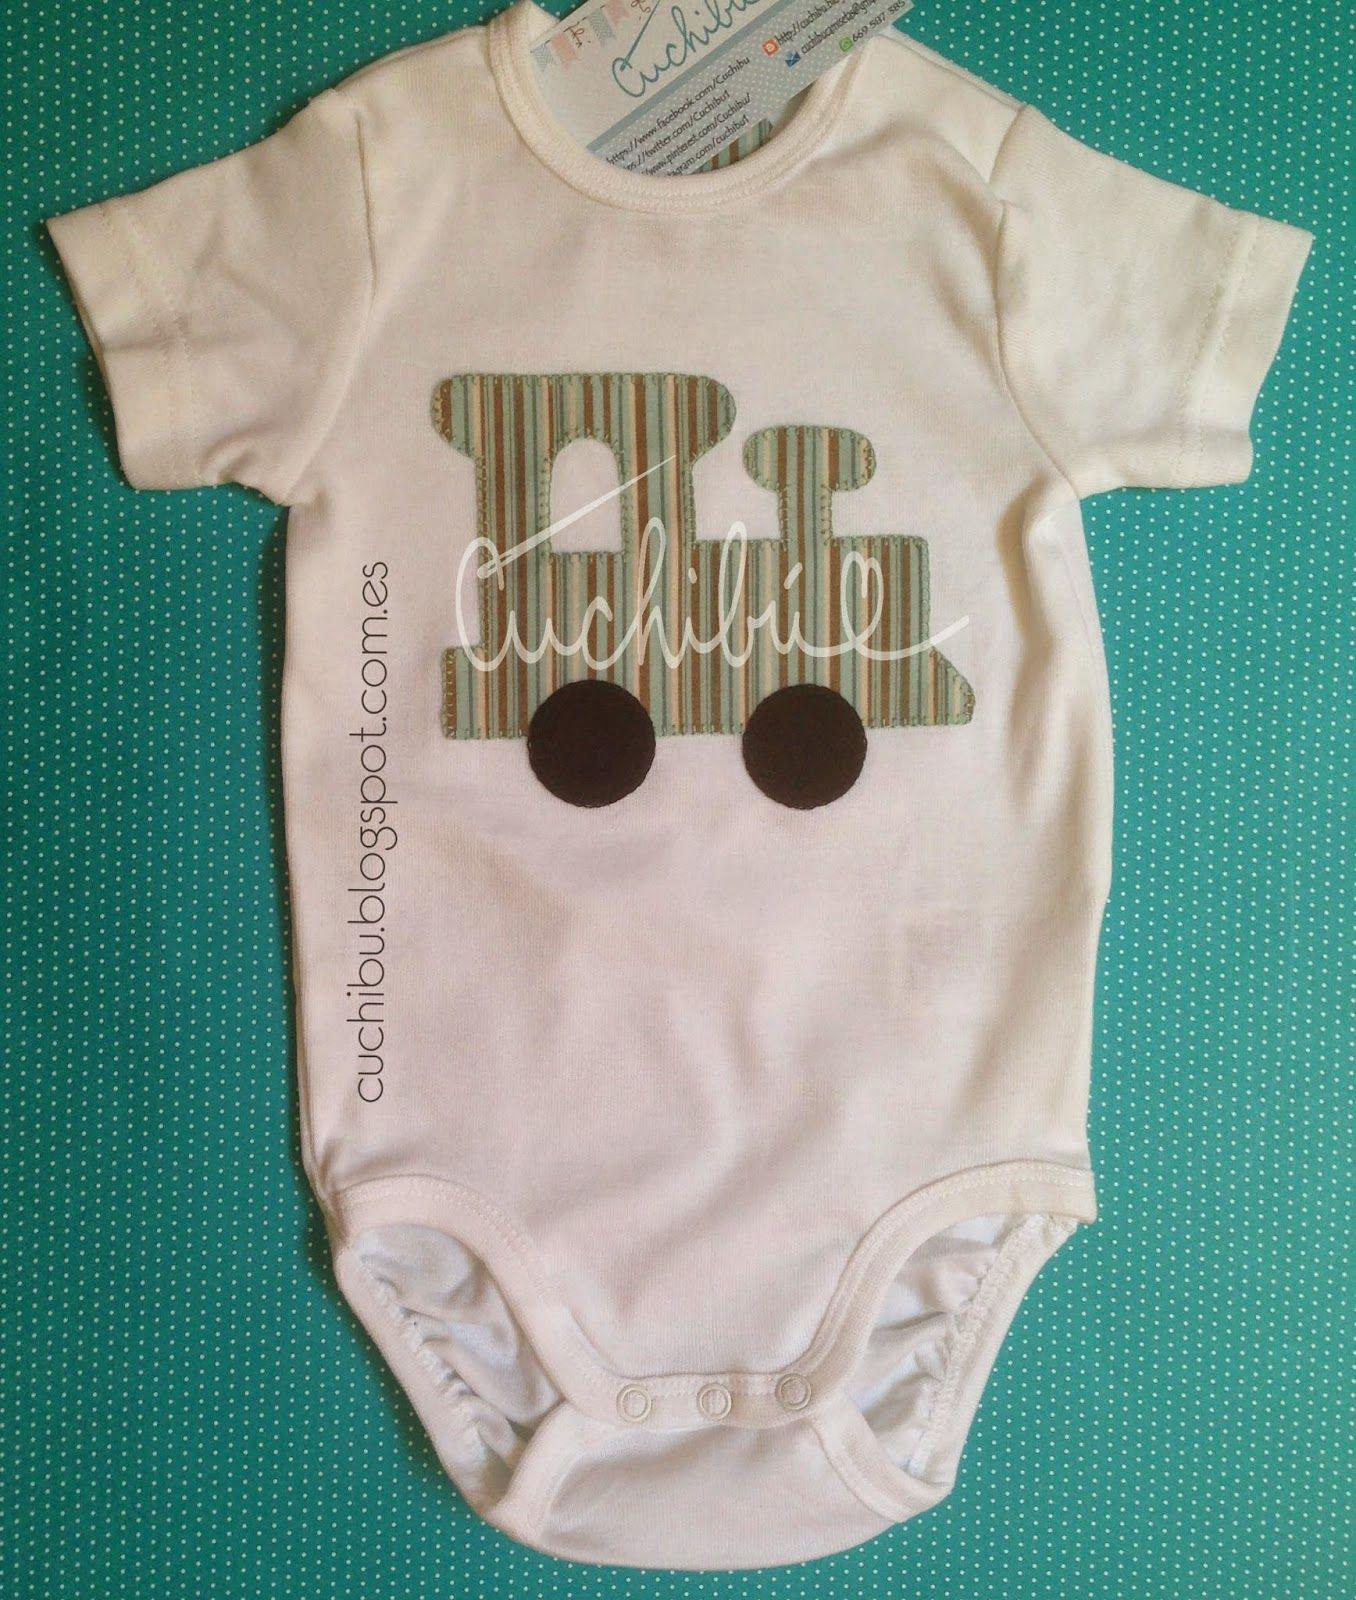 #bodies para #bebés decorados con bordado de aplicación a mano #handapplique #babyonesies #babyshower